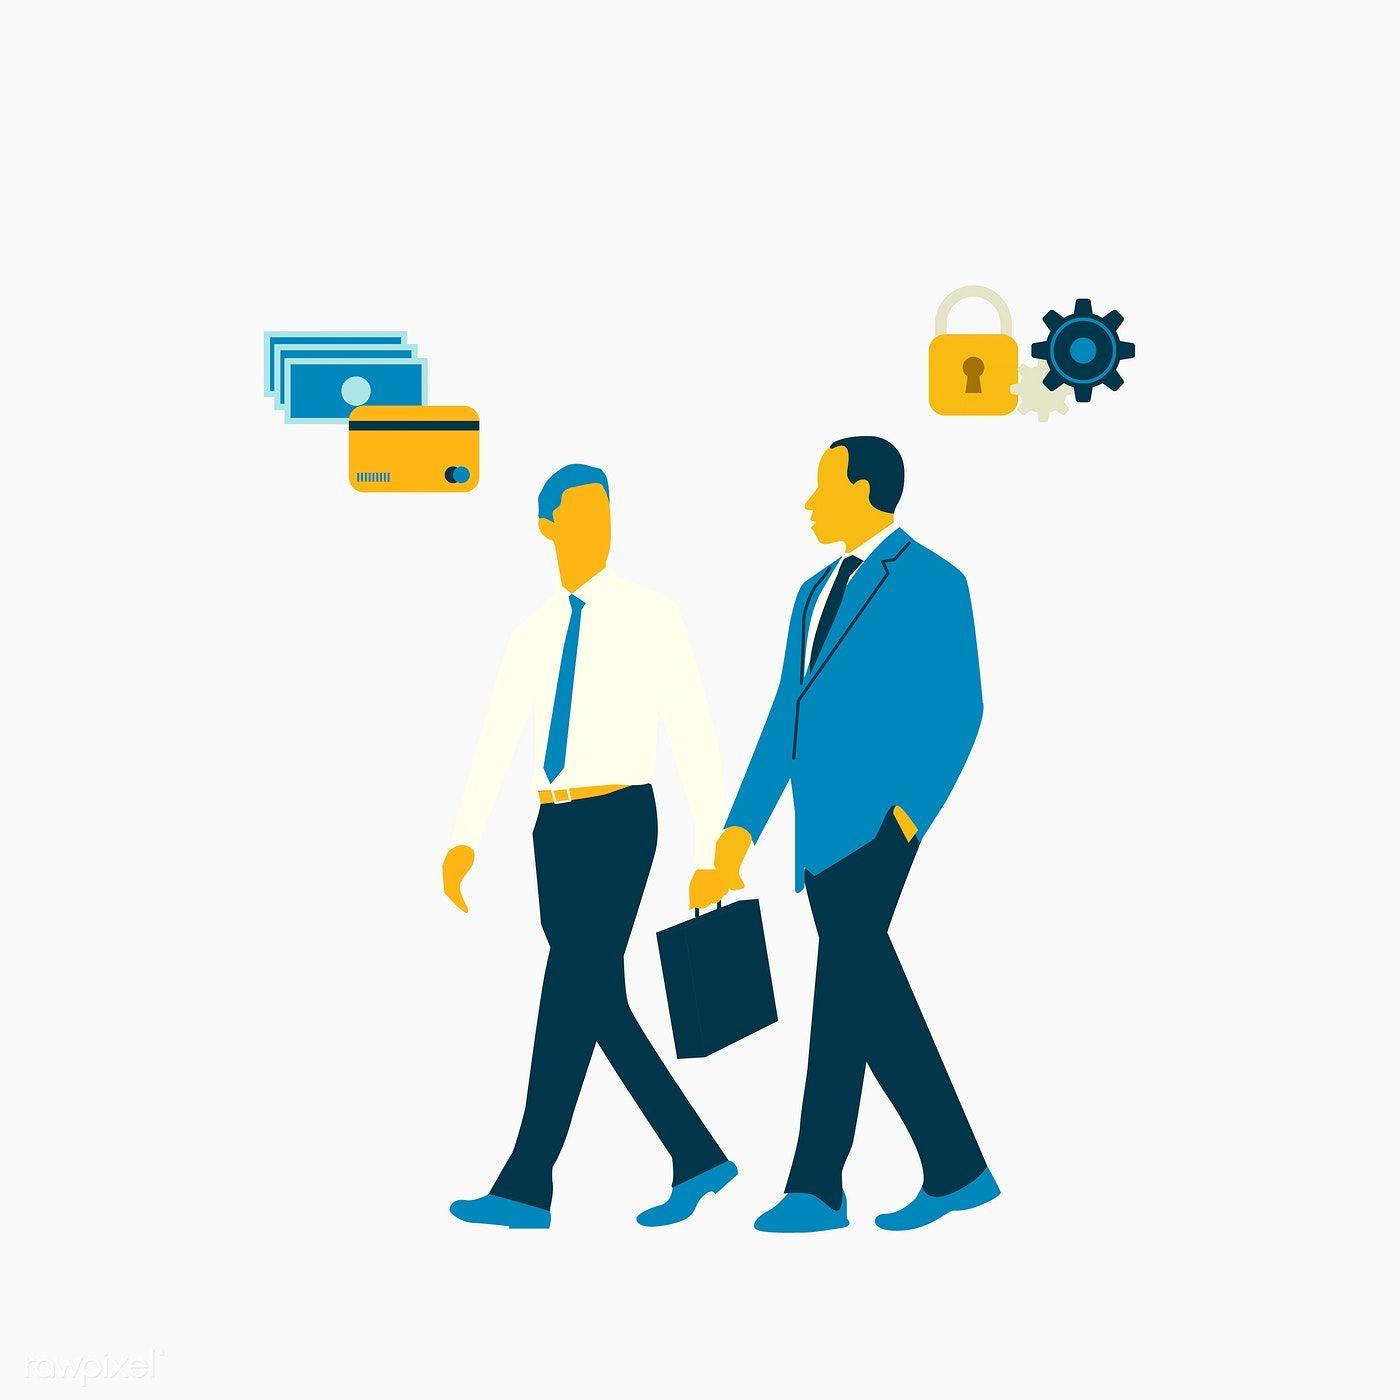 Download premium vector of illustrated business men